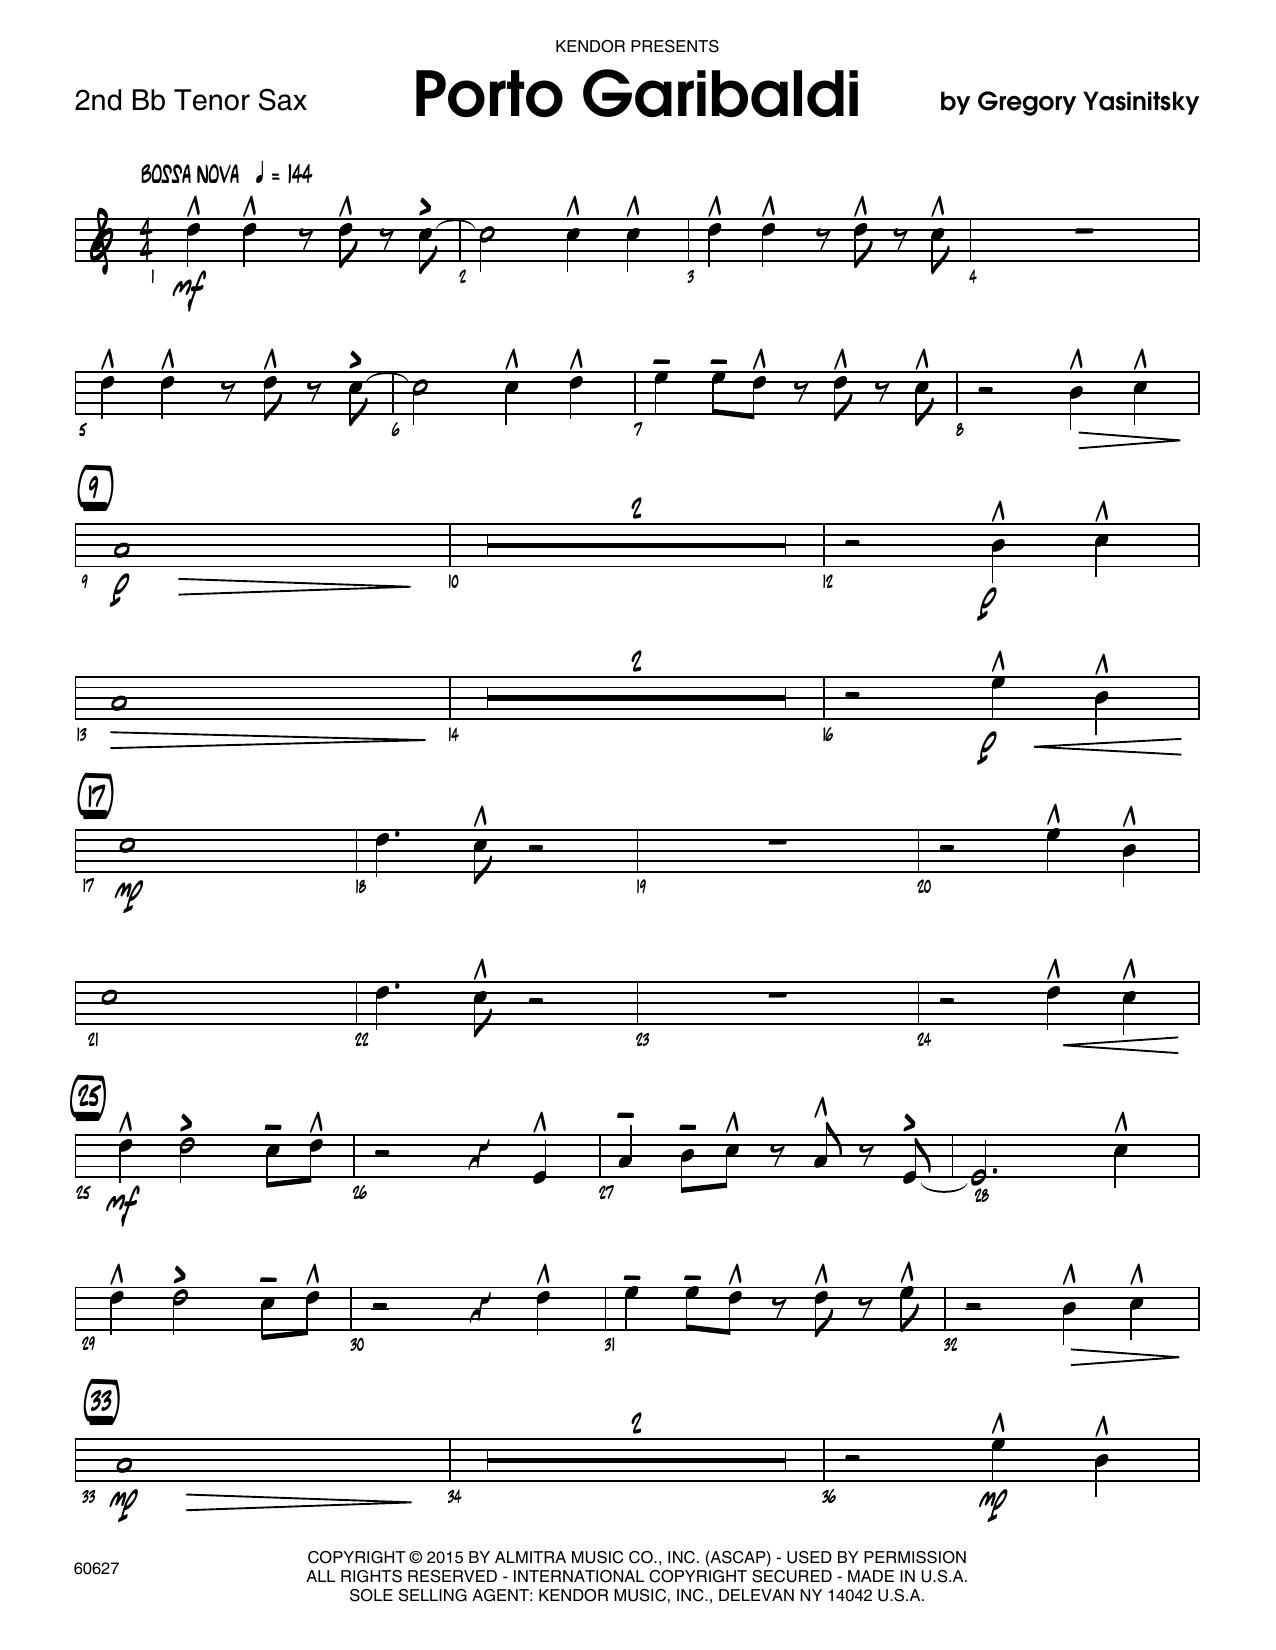 Porto Garibaldi - 2nd Bb Tenor Saxophone Sheet Music